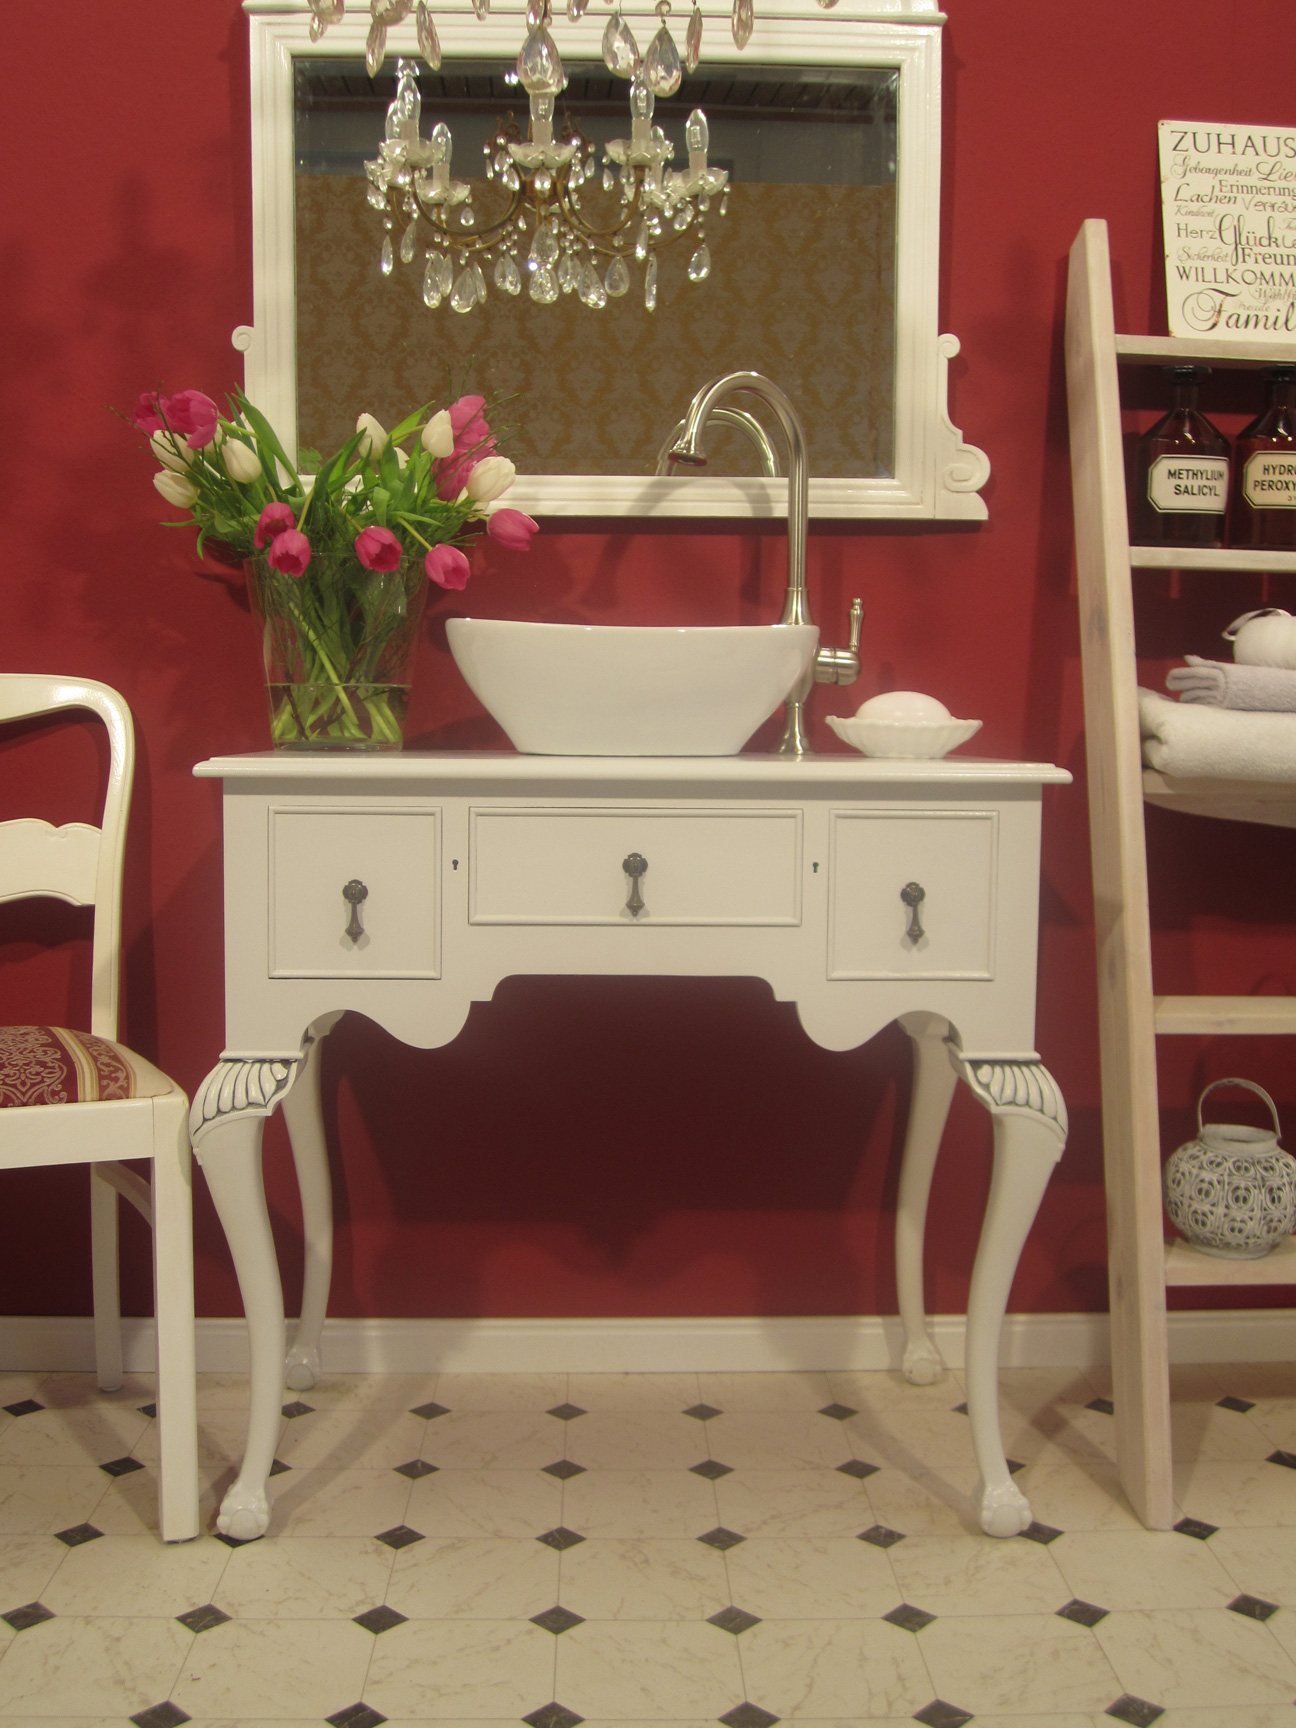 Waschtischunterschrank holz antik  Waschtischunterschrank Holz Antik: Vintage antik landhausstil holz ...